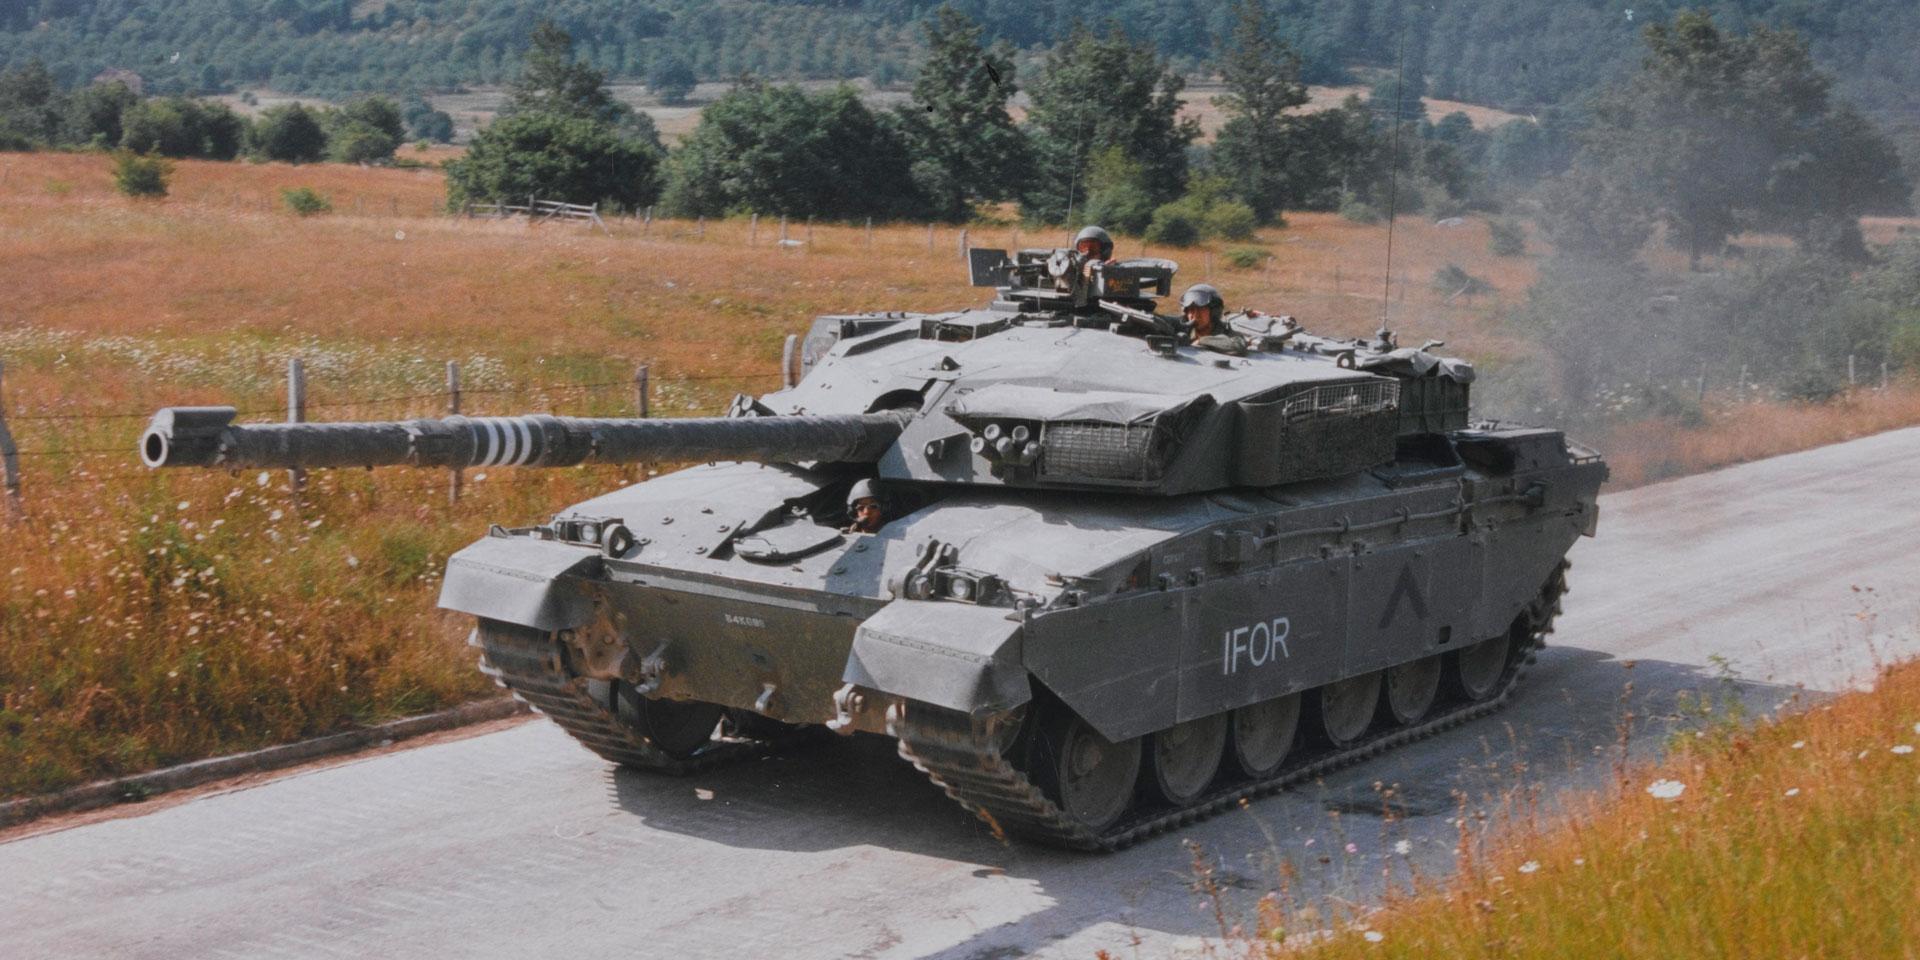 A Challenger 1 tank in Bosnia, c1997